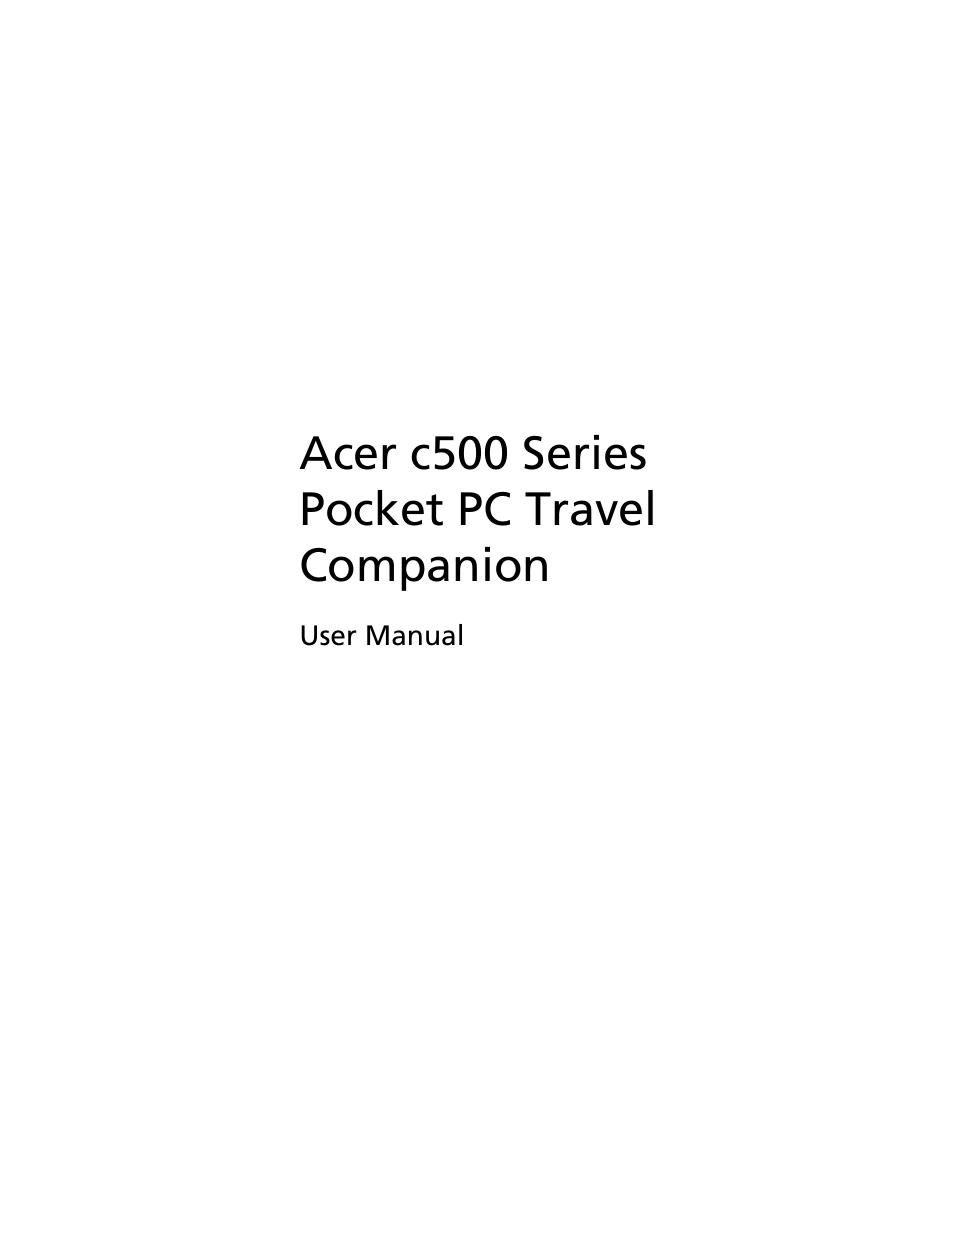 acer c500 user manual 54 pages rh manualsdir com Acer Service Manual Acer Service Manual